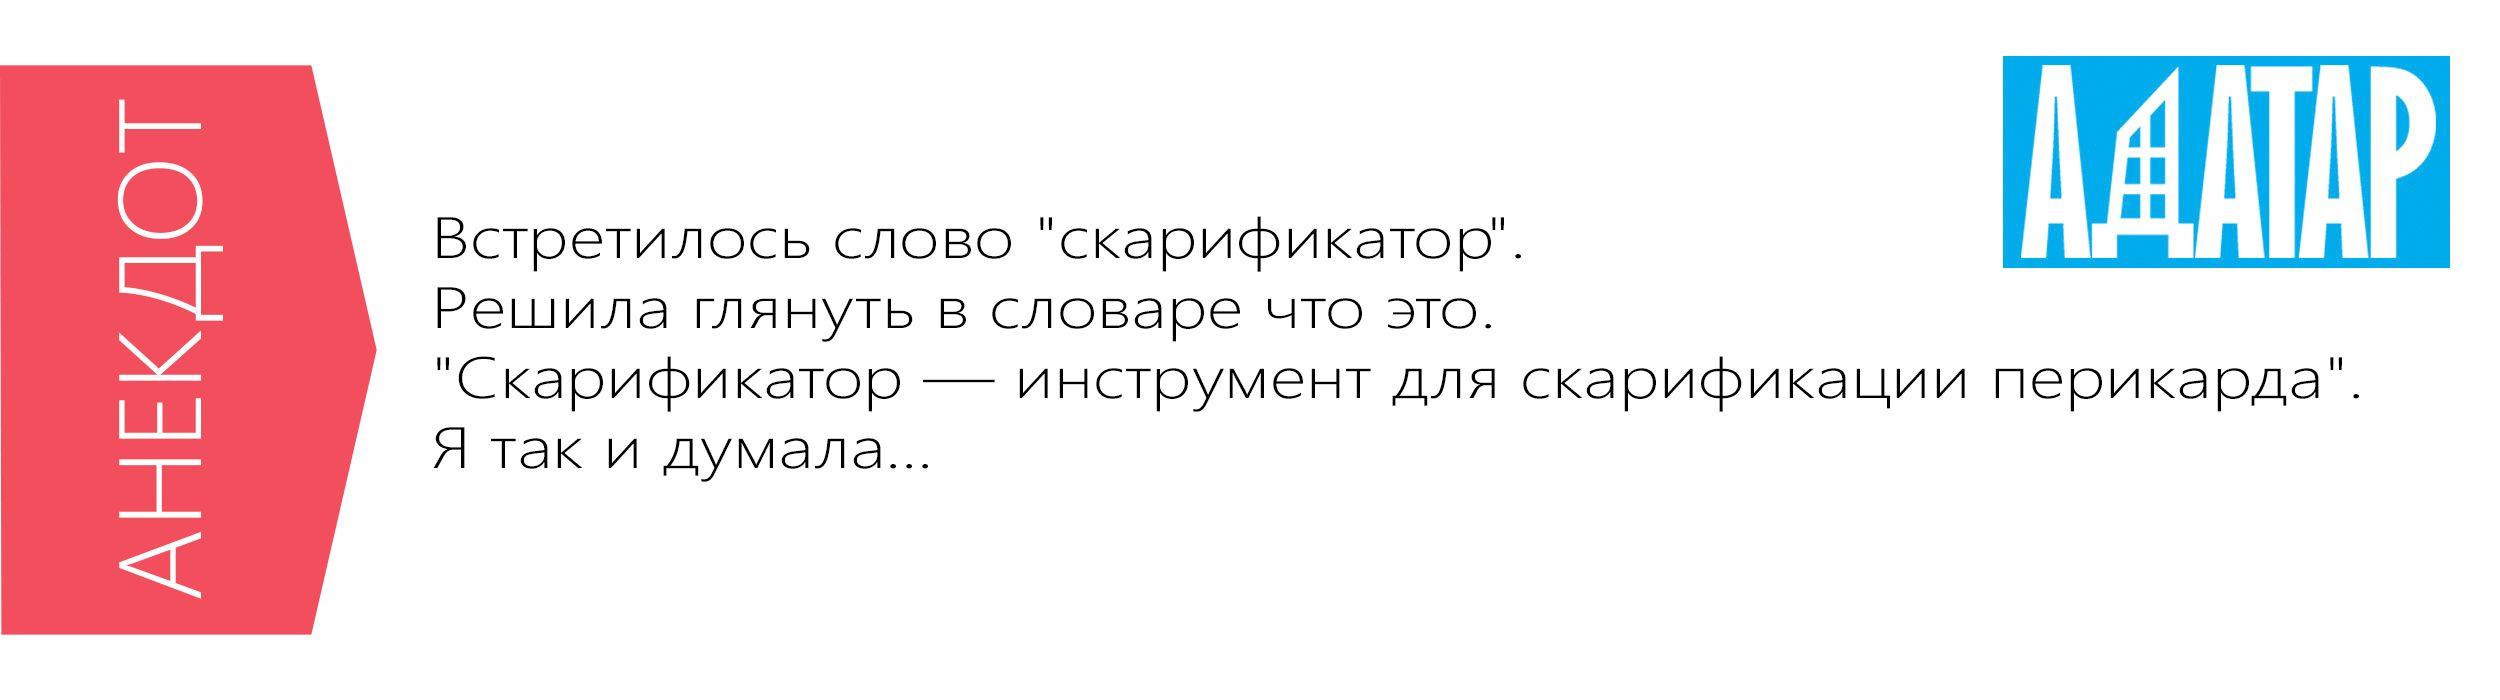 АНЕКДОТ 42.jpg